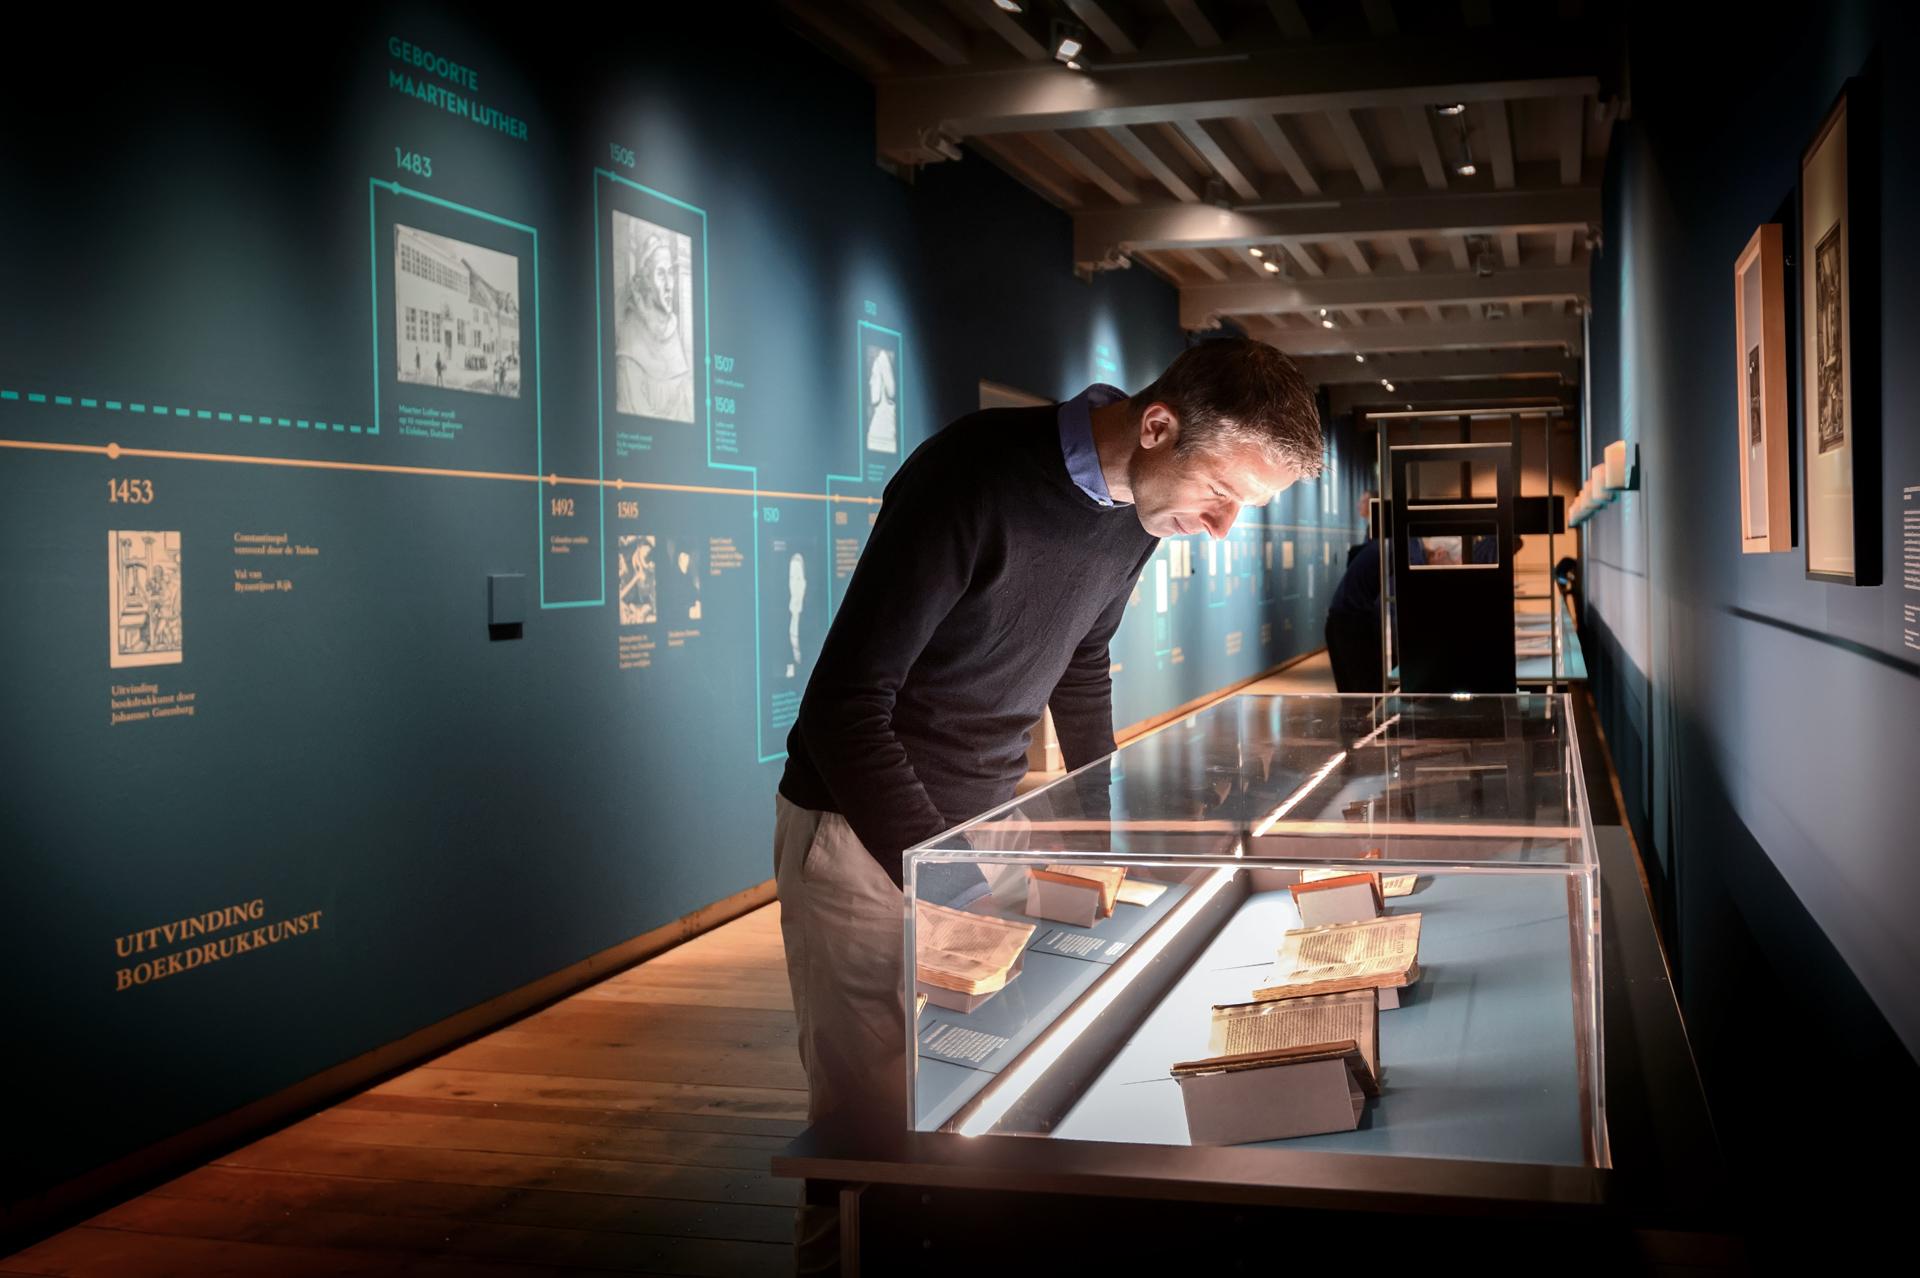 tentoonstellingsontwerp luther museum catherijneconvent 5 1 jpg